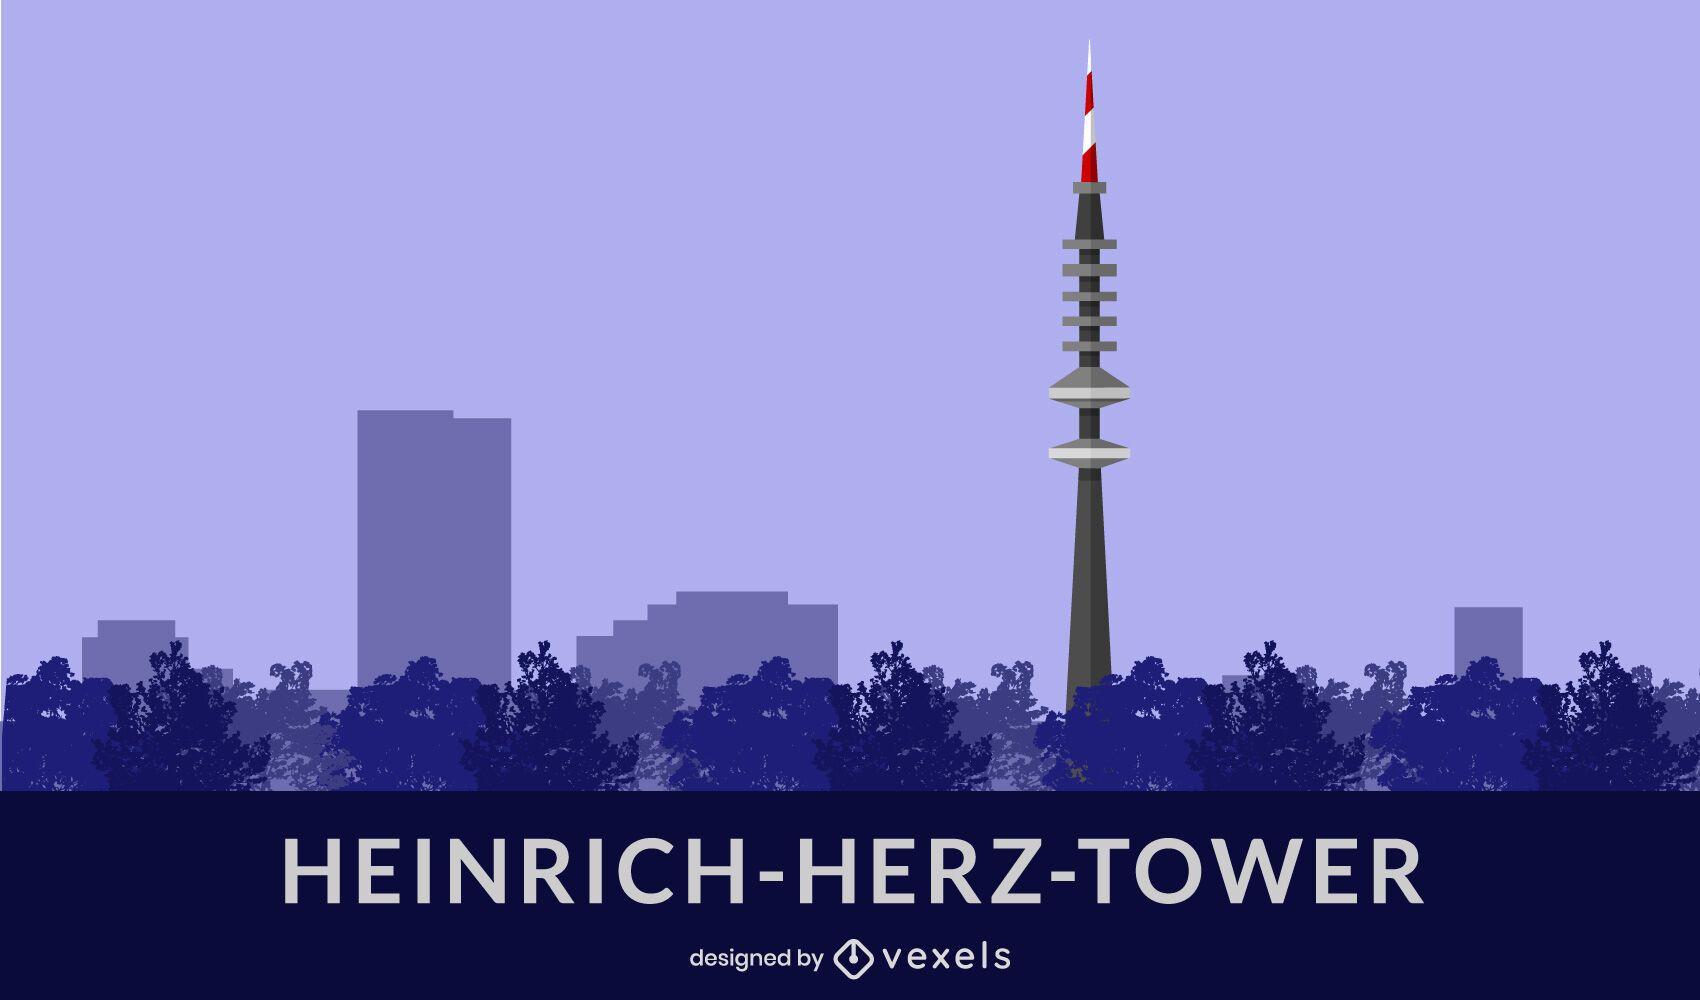 Diseño plano de la torre Heinrich-Herz